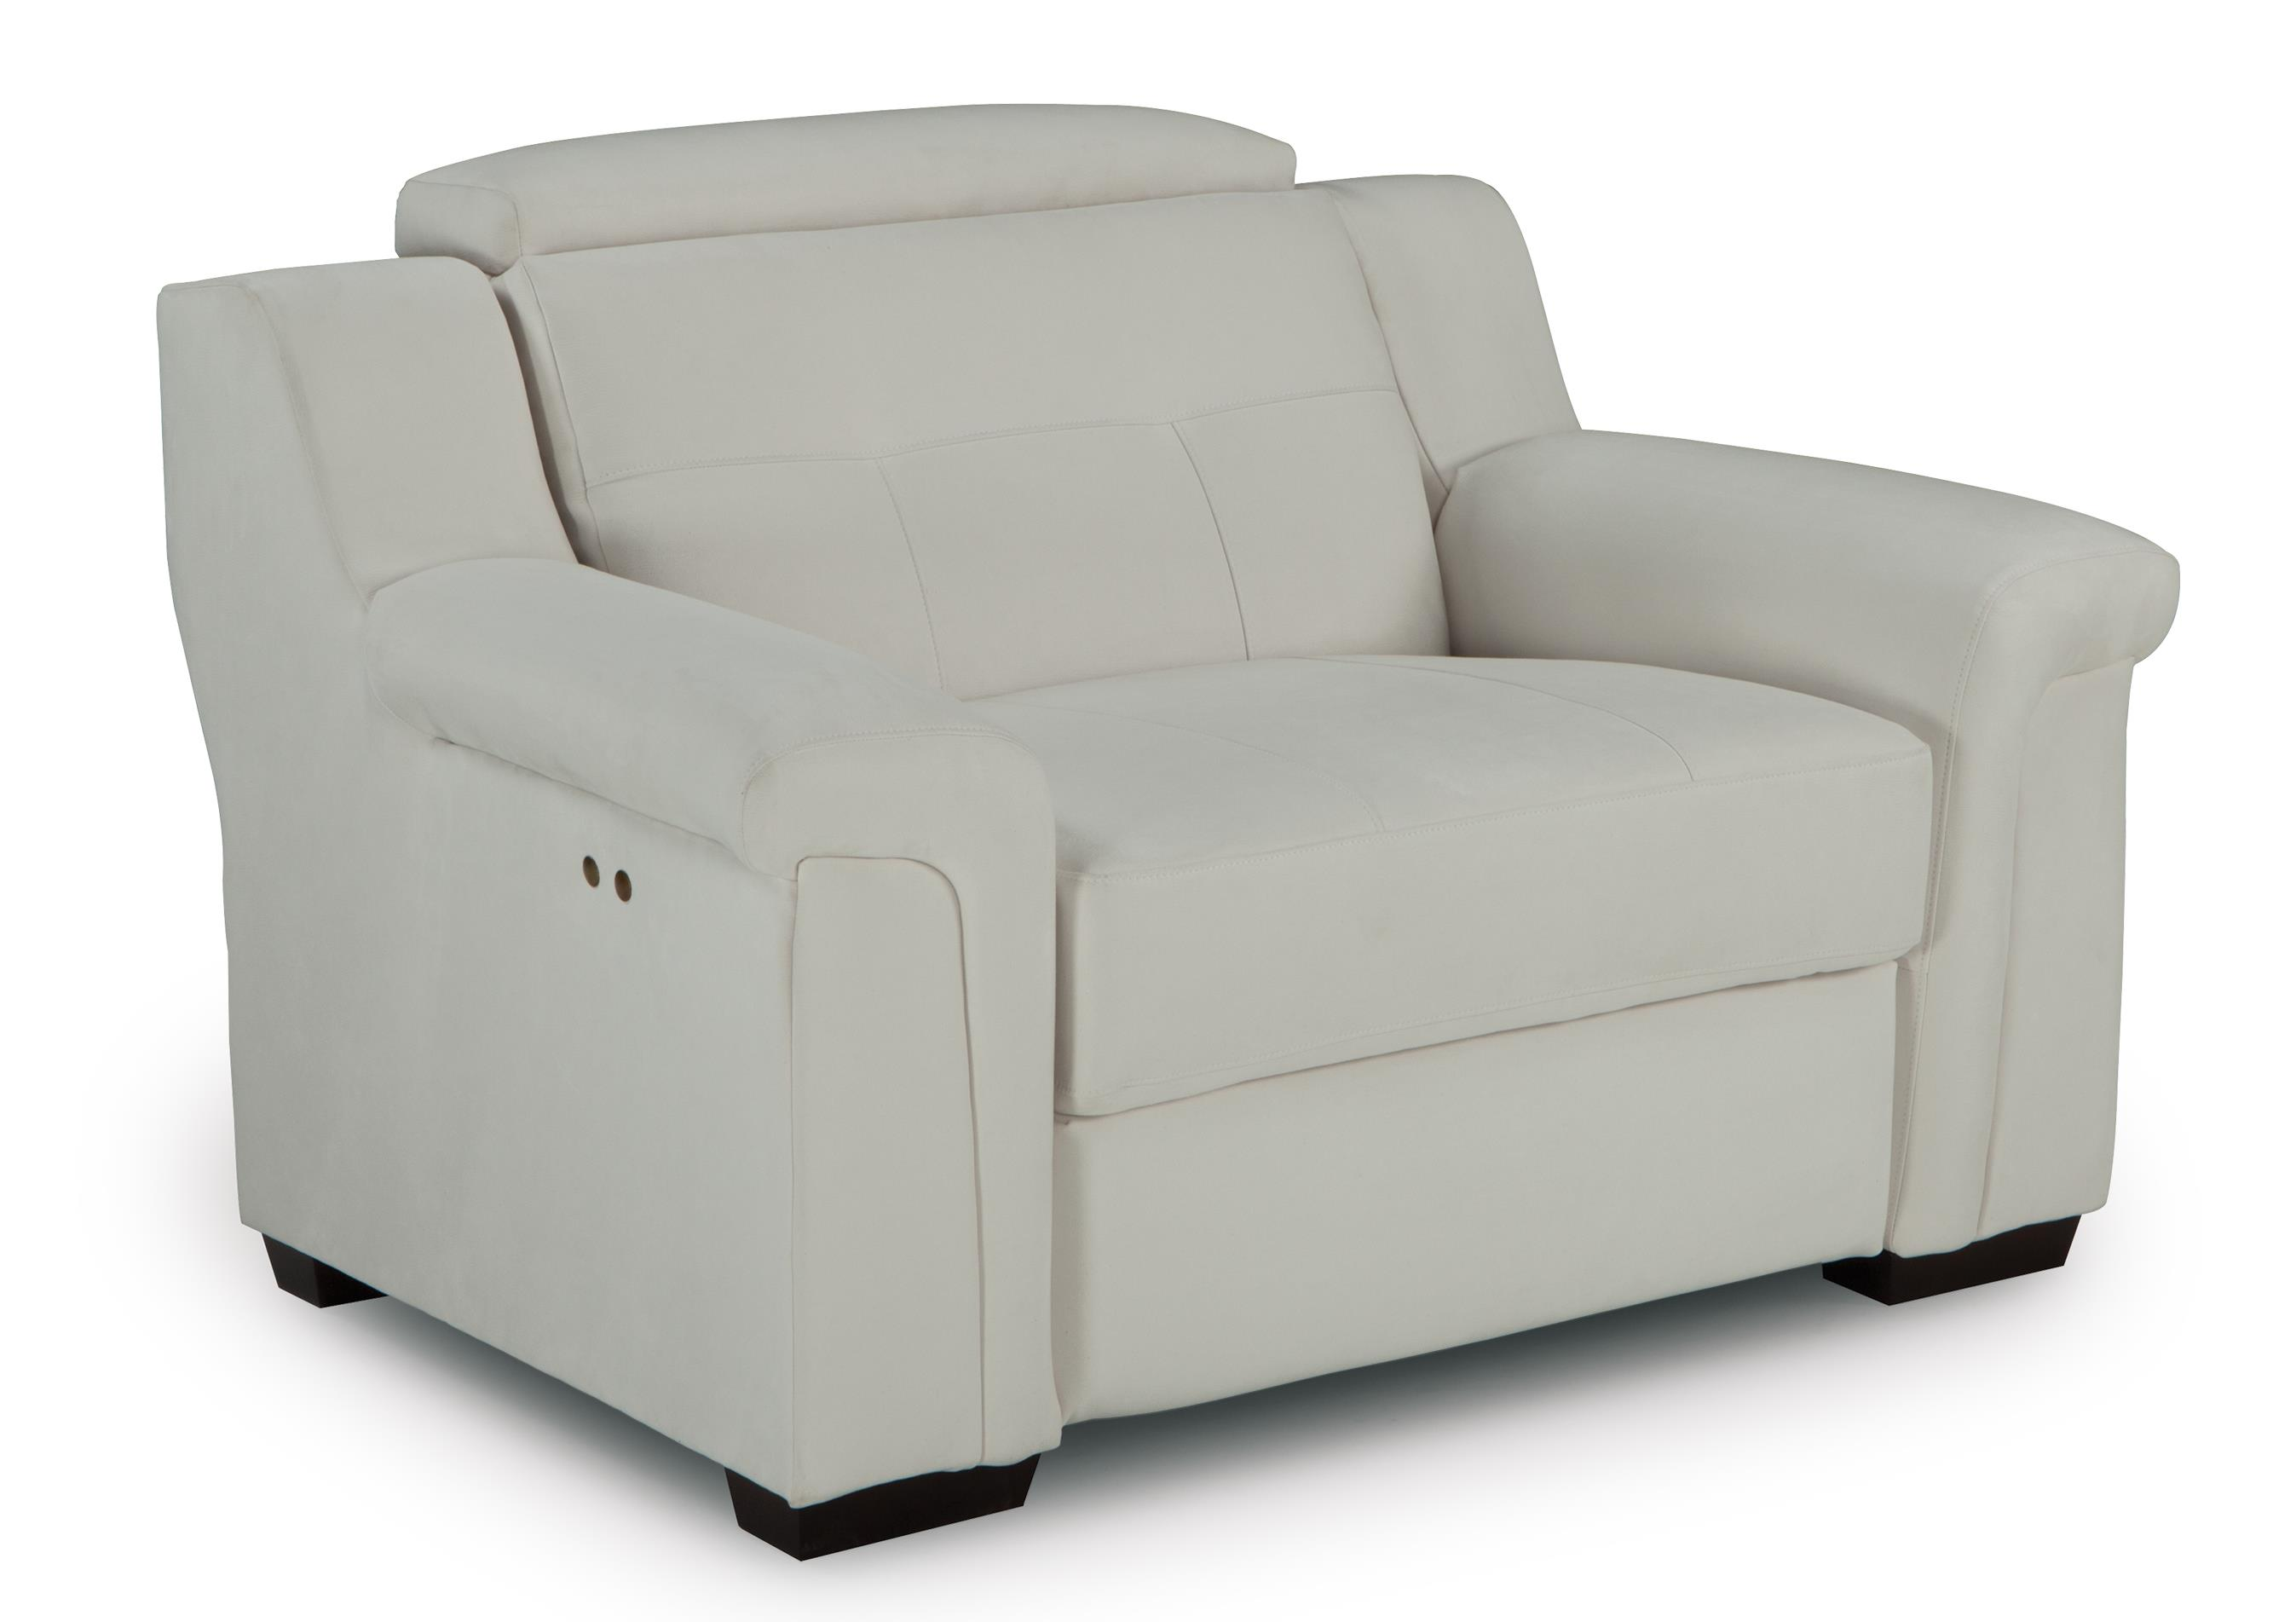 Oversized Power High Leg Recliner with Adjustable Headrest  sc 1 st  Wolf Furniture & Oversized Power High Leg Recliner with Adjustable Headrest by Best ... islam-shia.org